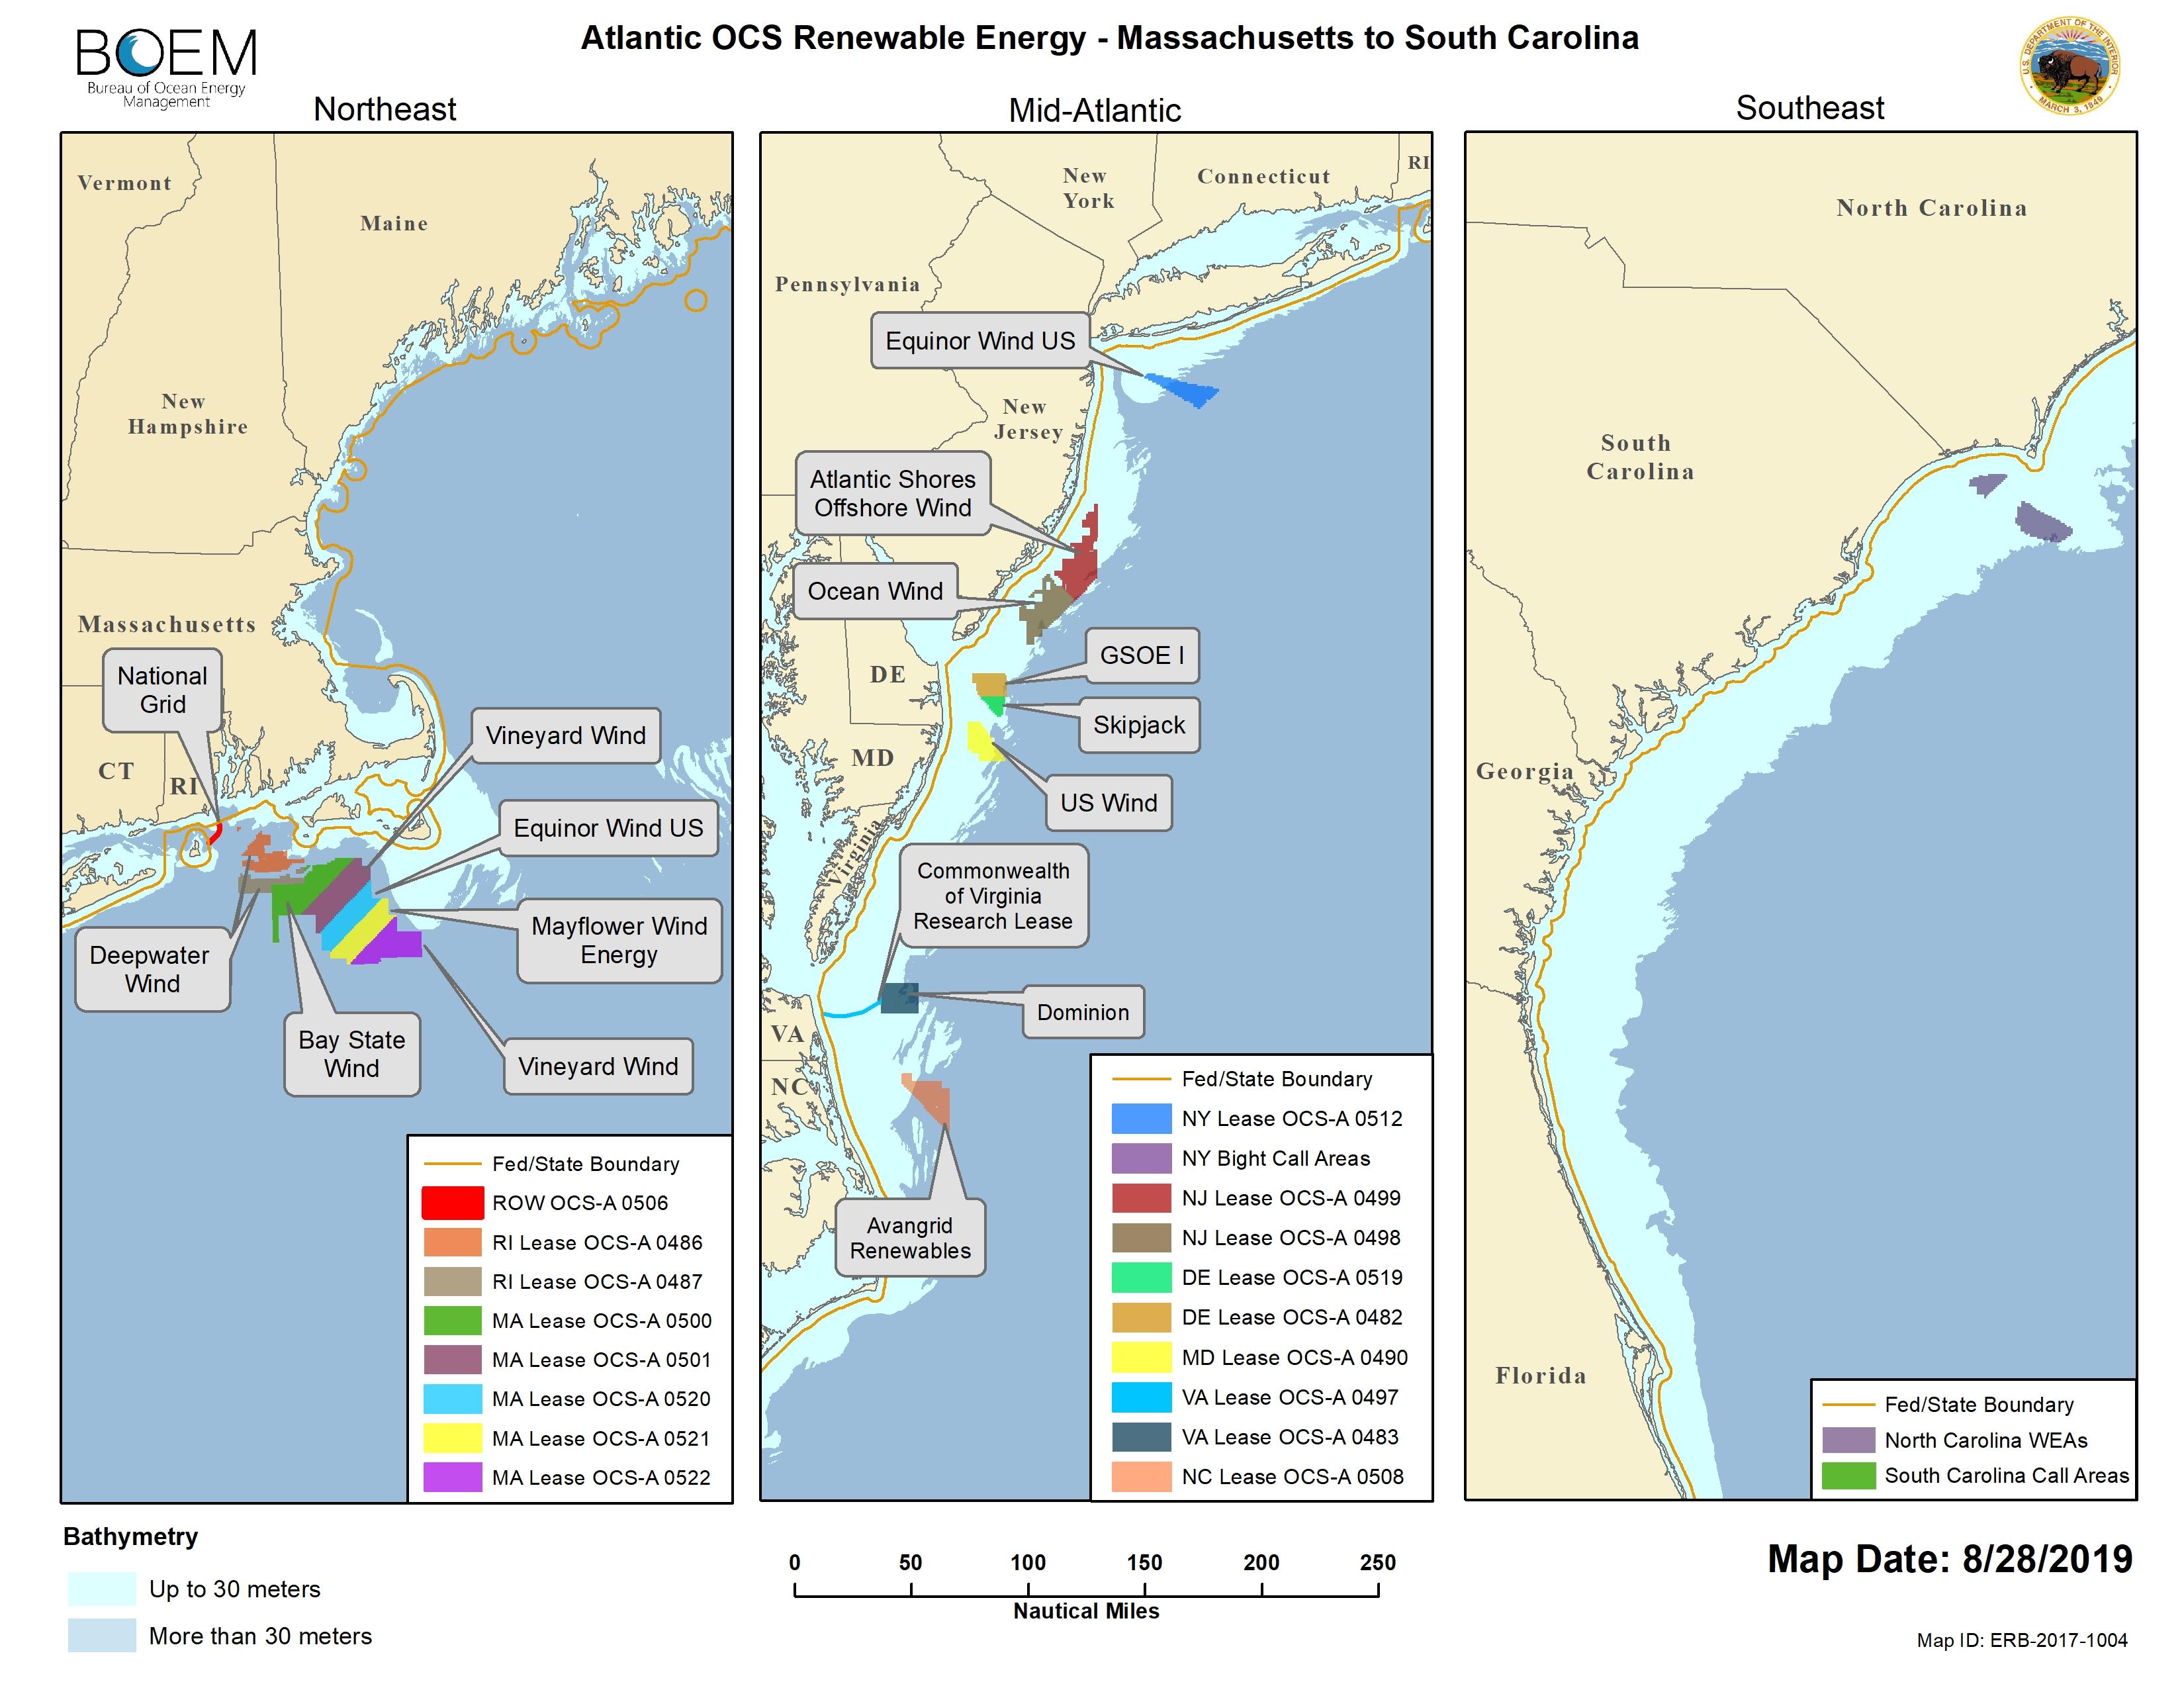 Renewable Energy GIS Data | Bureau of Ocean Energy Management